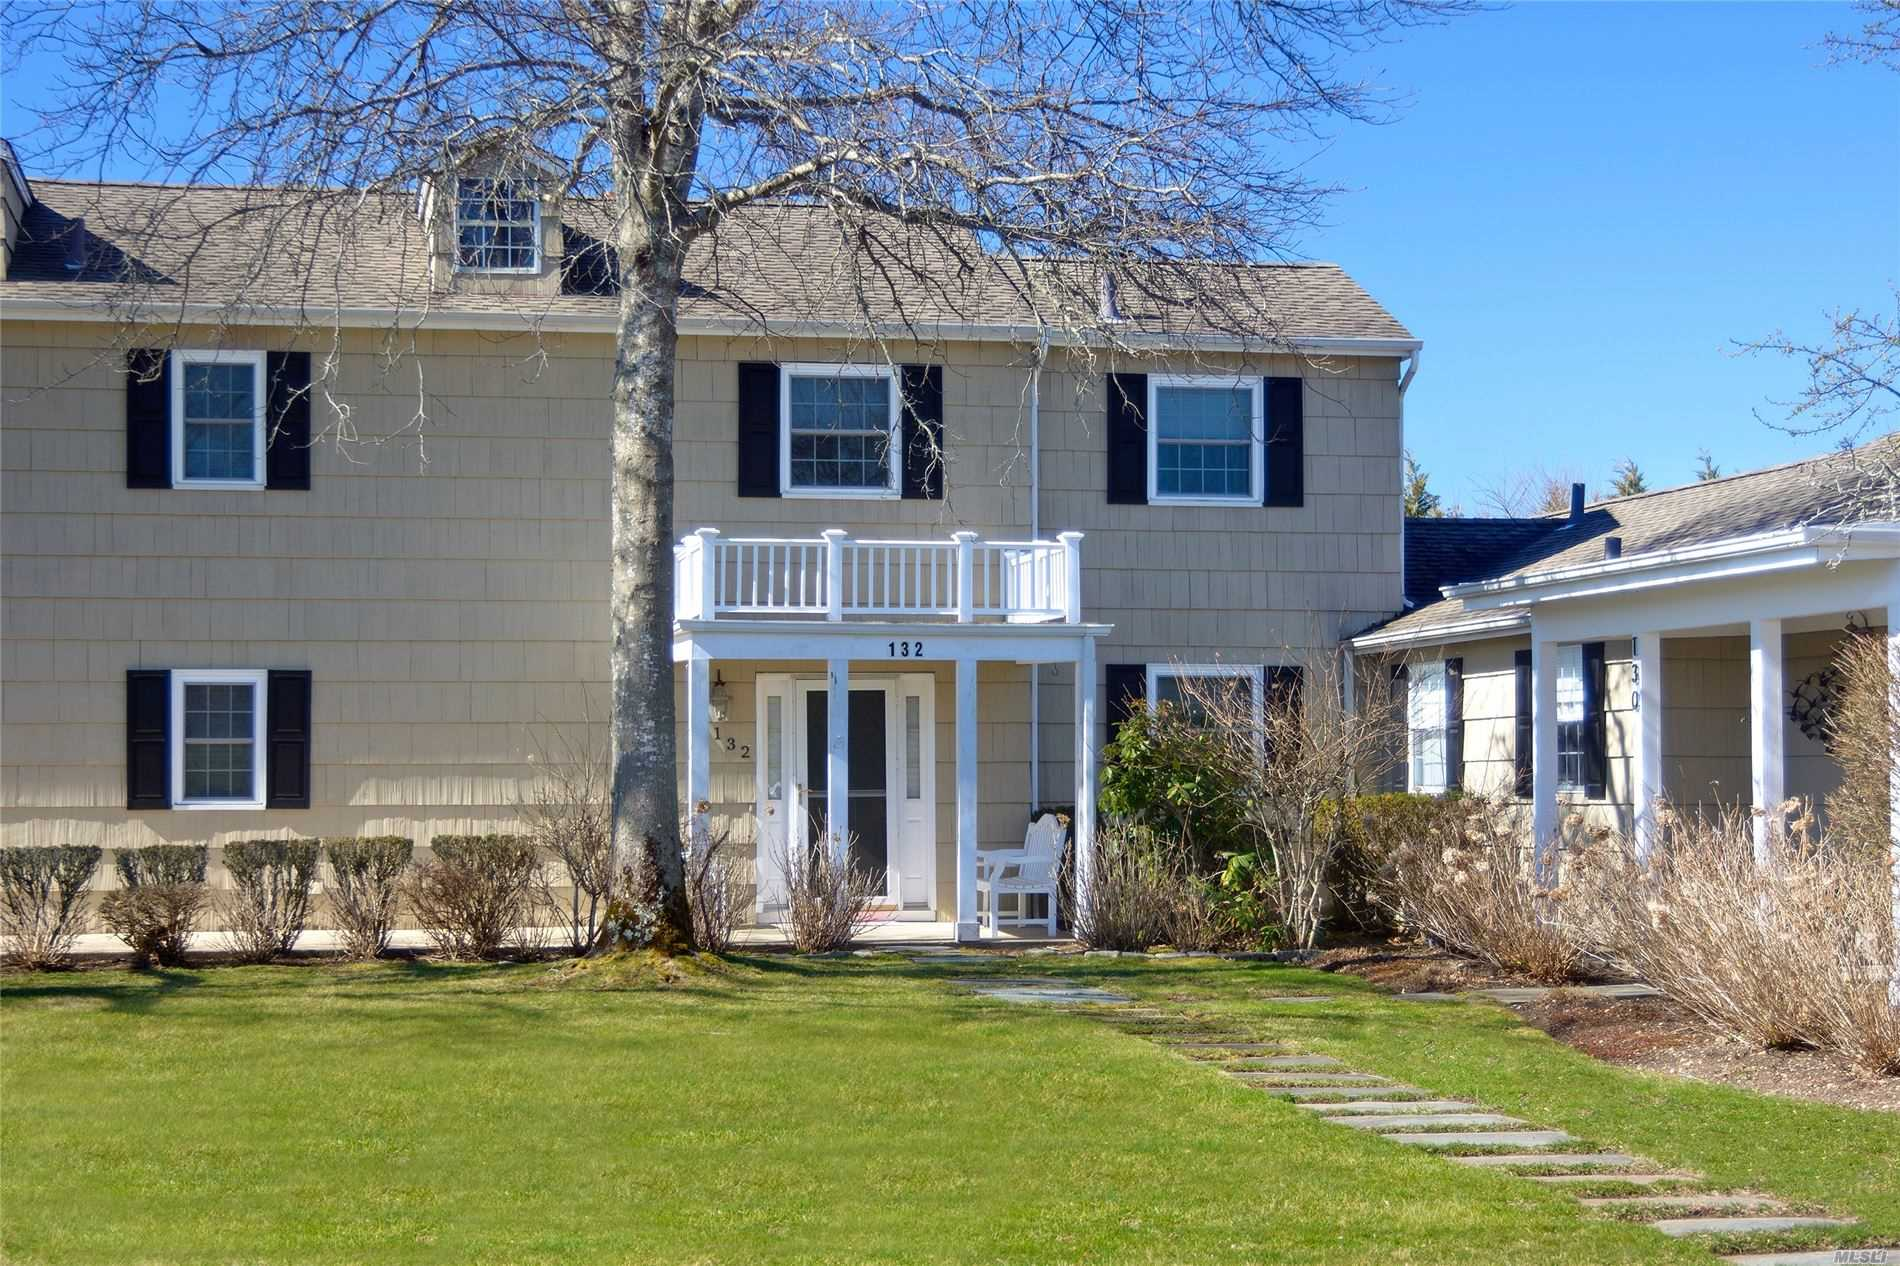 Property for sale at 132 Saint Andrews Circle, Southampton NY 11968, Southampton,  New York 11968